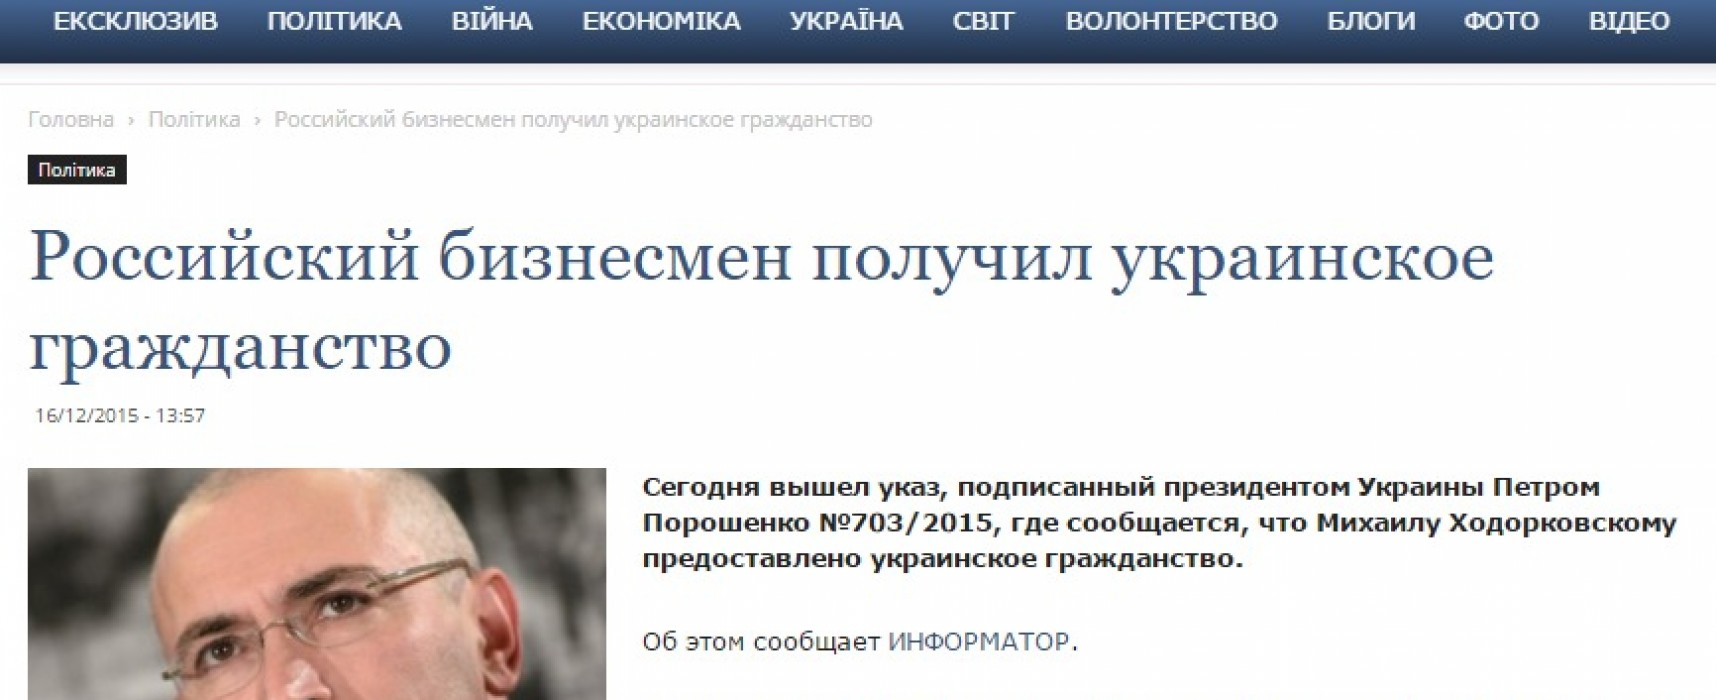 Fake: Khodorkovski a reçu la nationalité ukrainienne